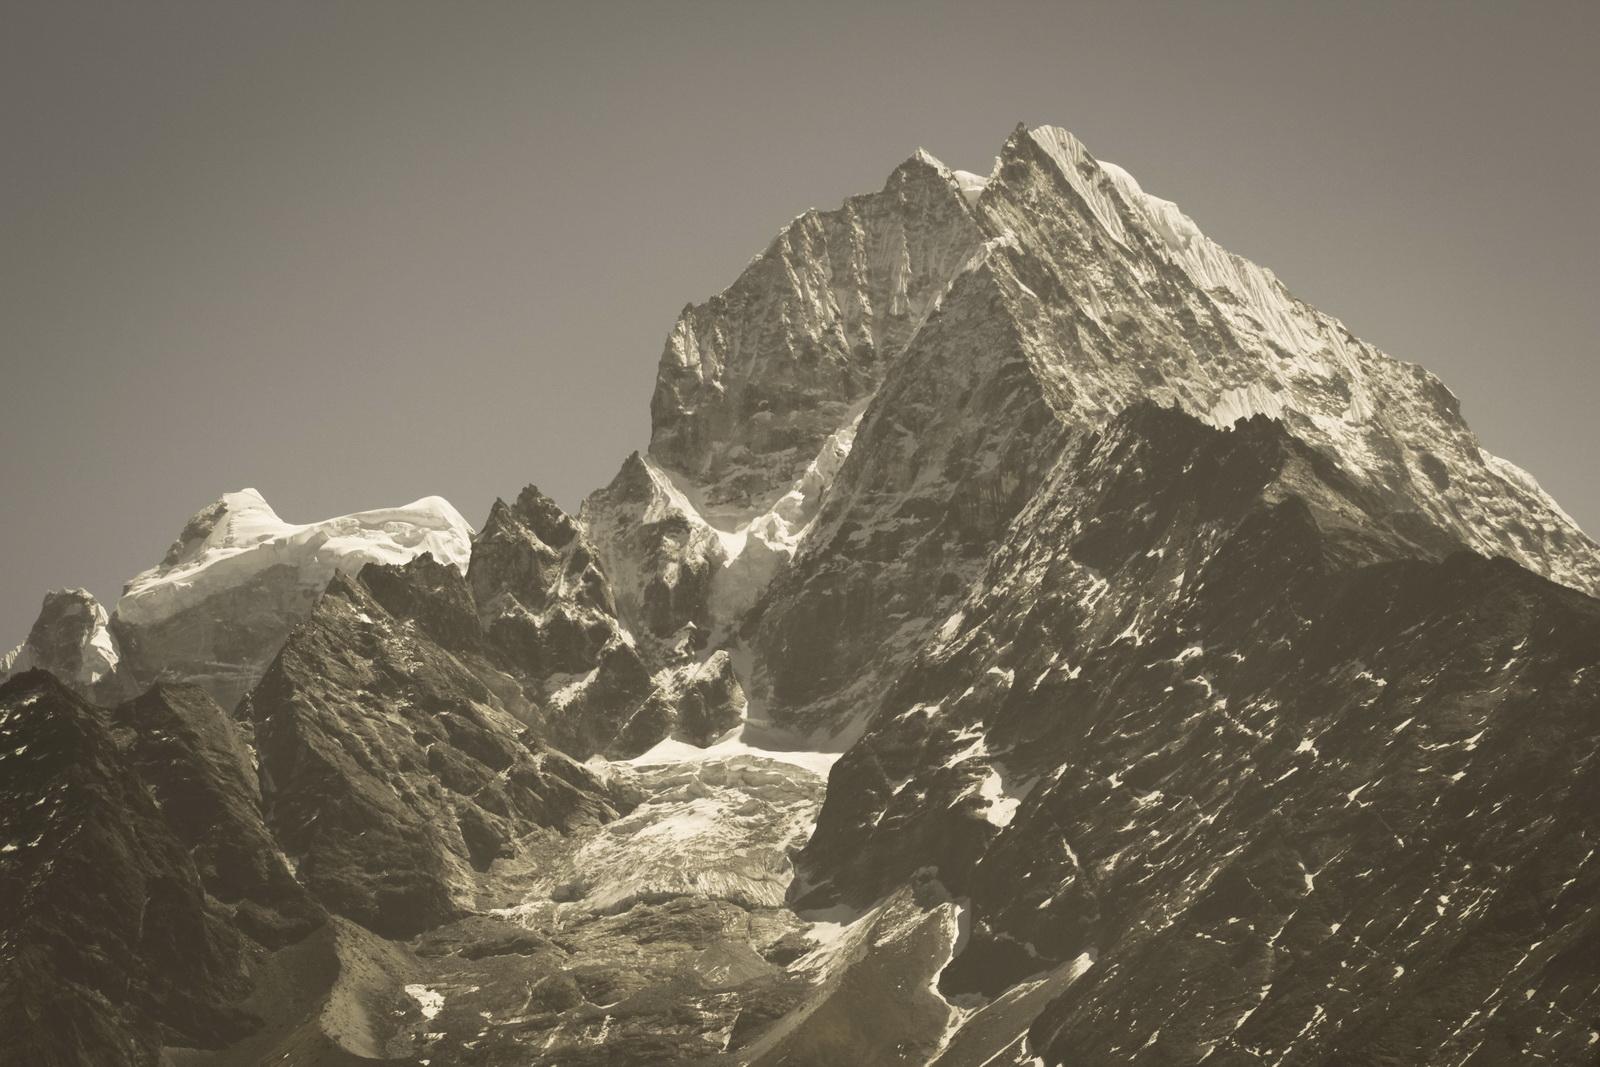 Непал, район Кхумбу, Тамсерку